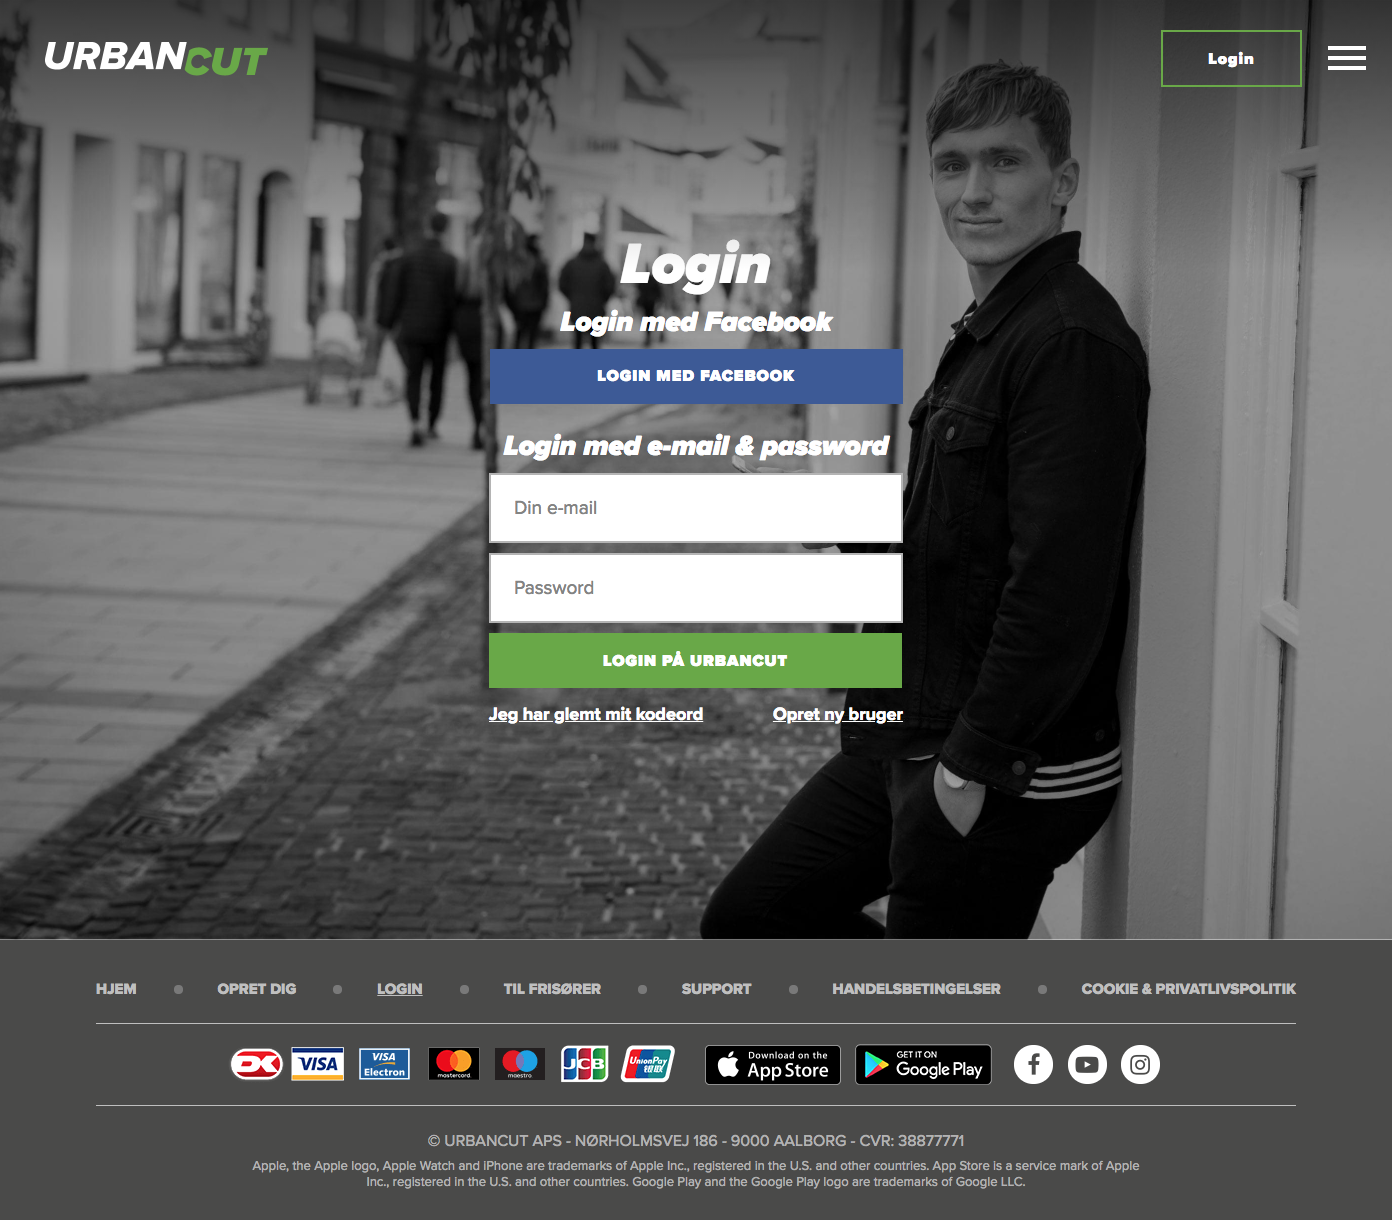 screencapture-urbancut-dk-login-2018-05-11-10_48_01.png